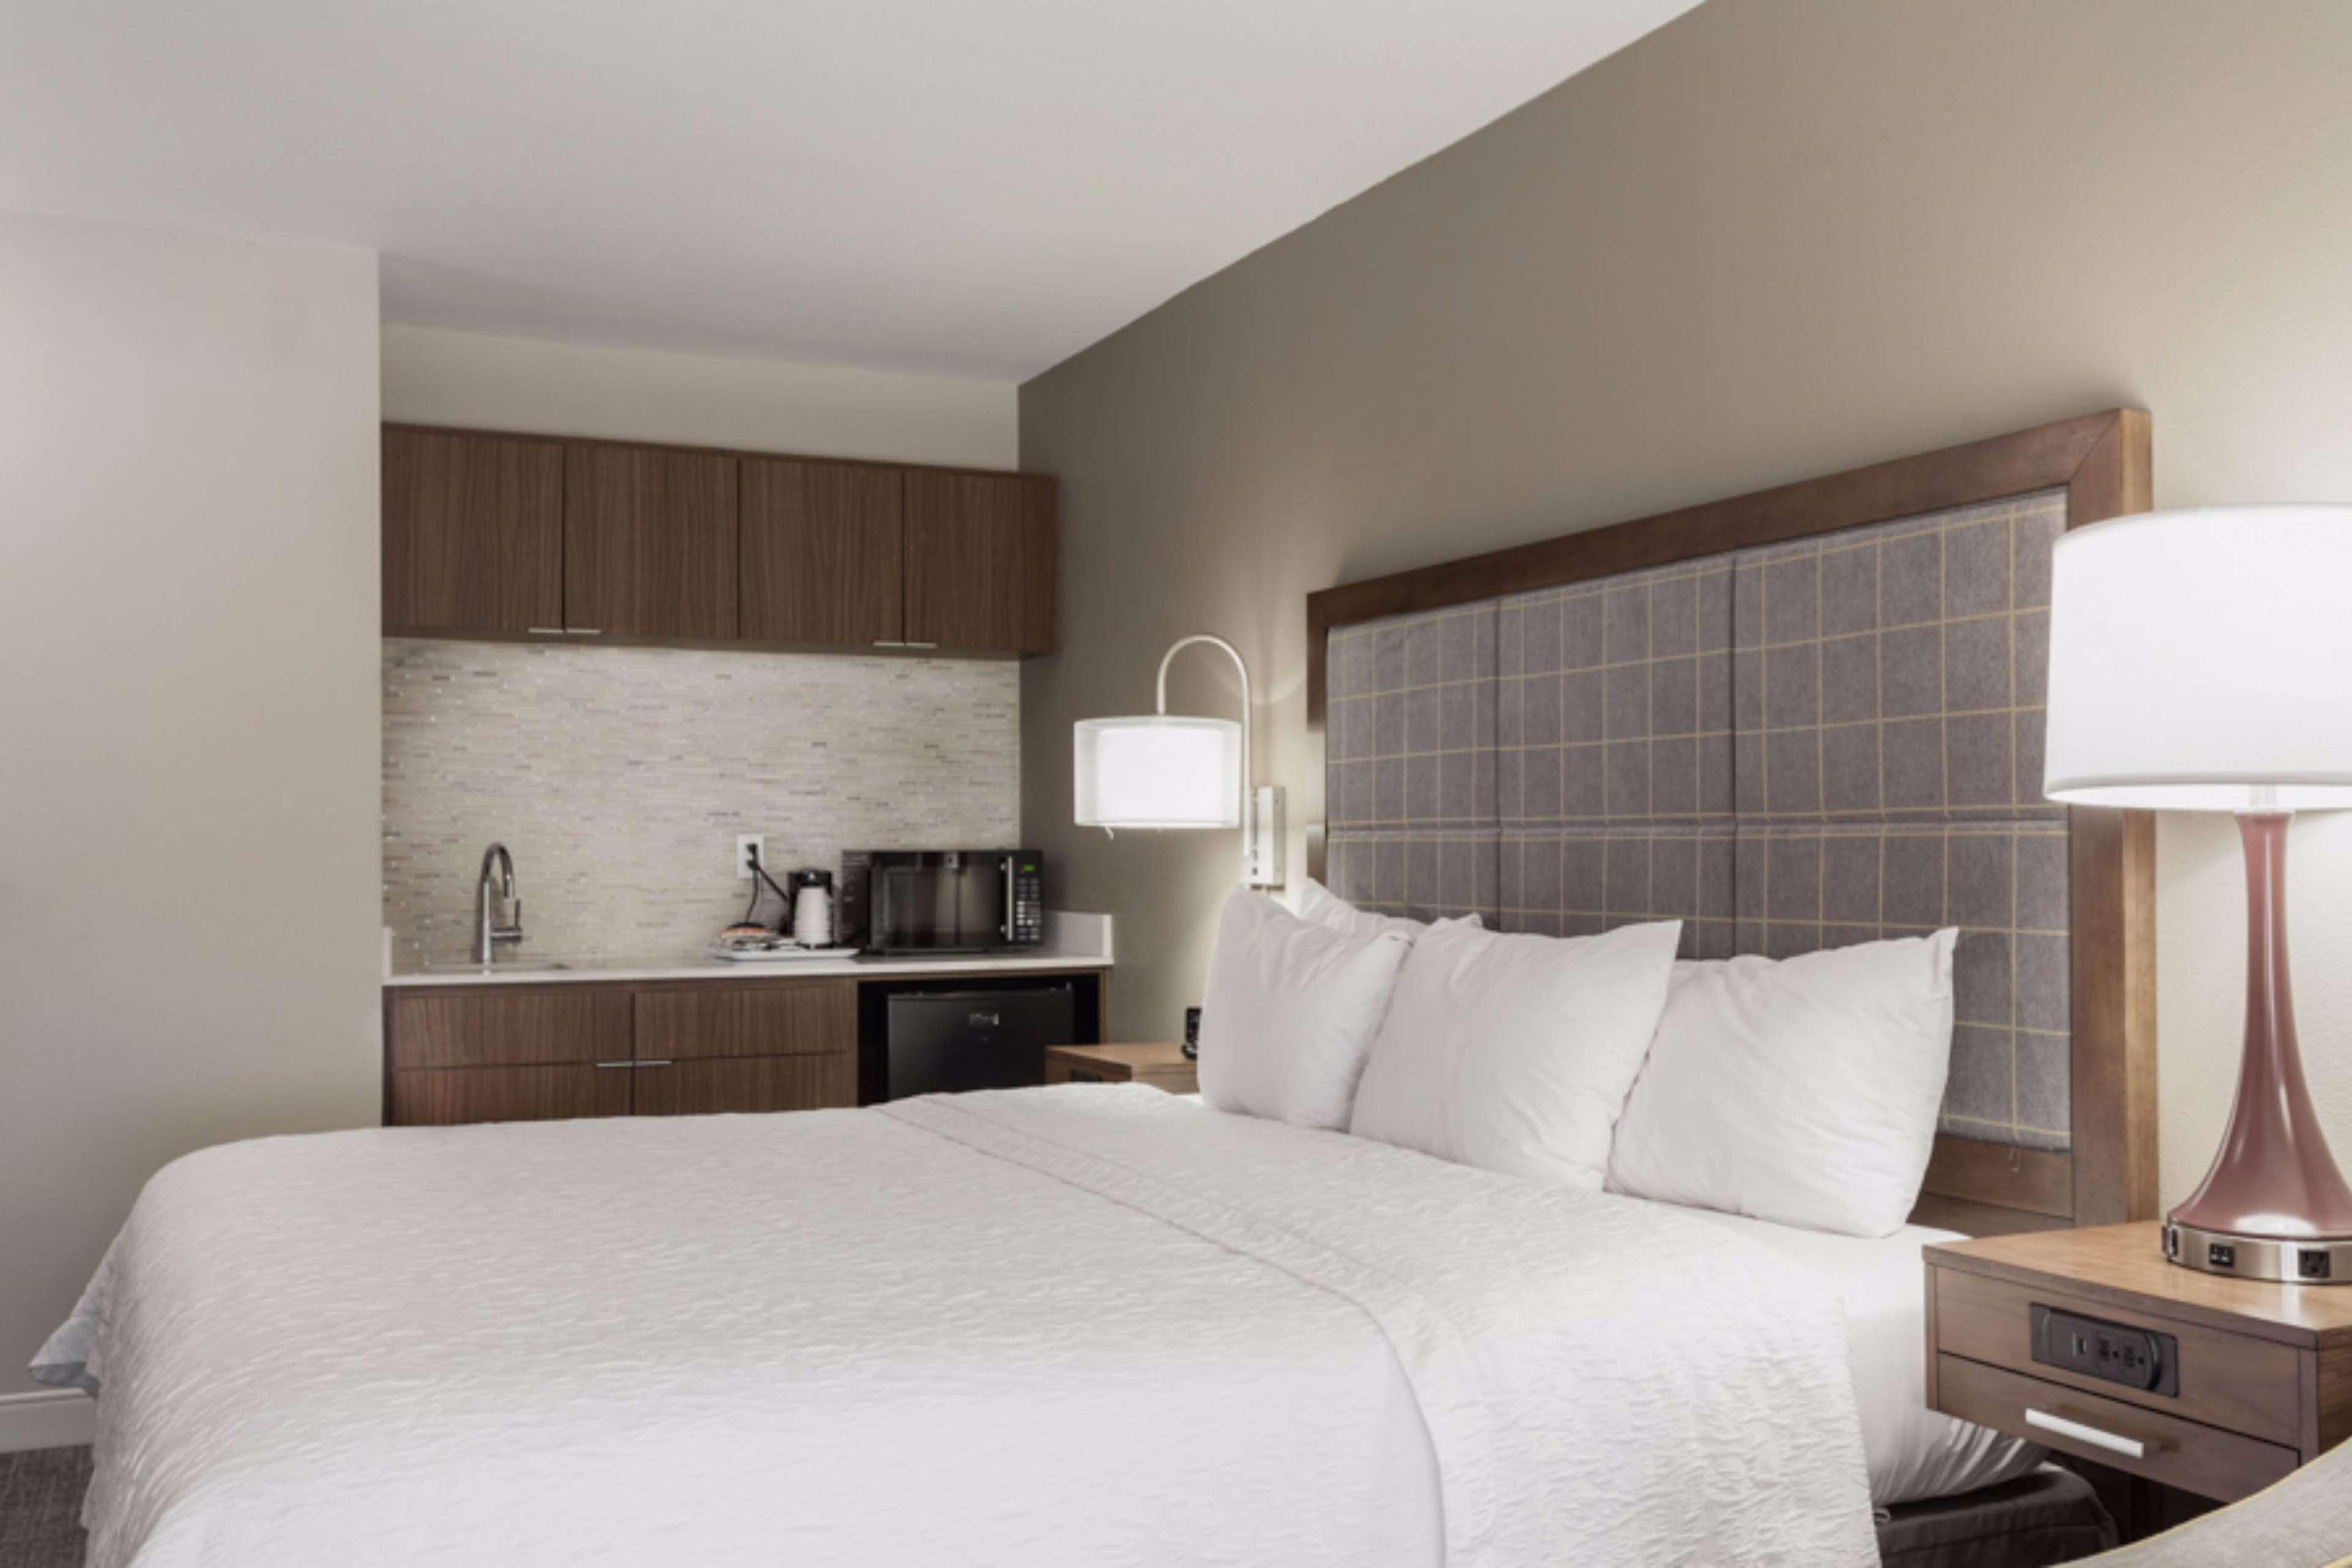 Hampton Inn & Suites Dallas-DFW Airport North-Grapevine image 19